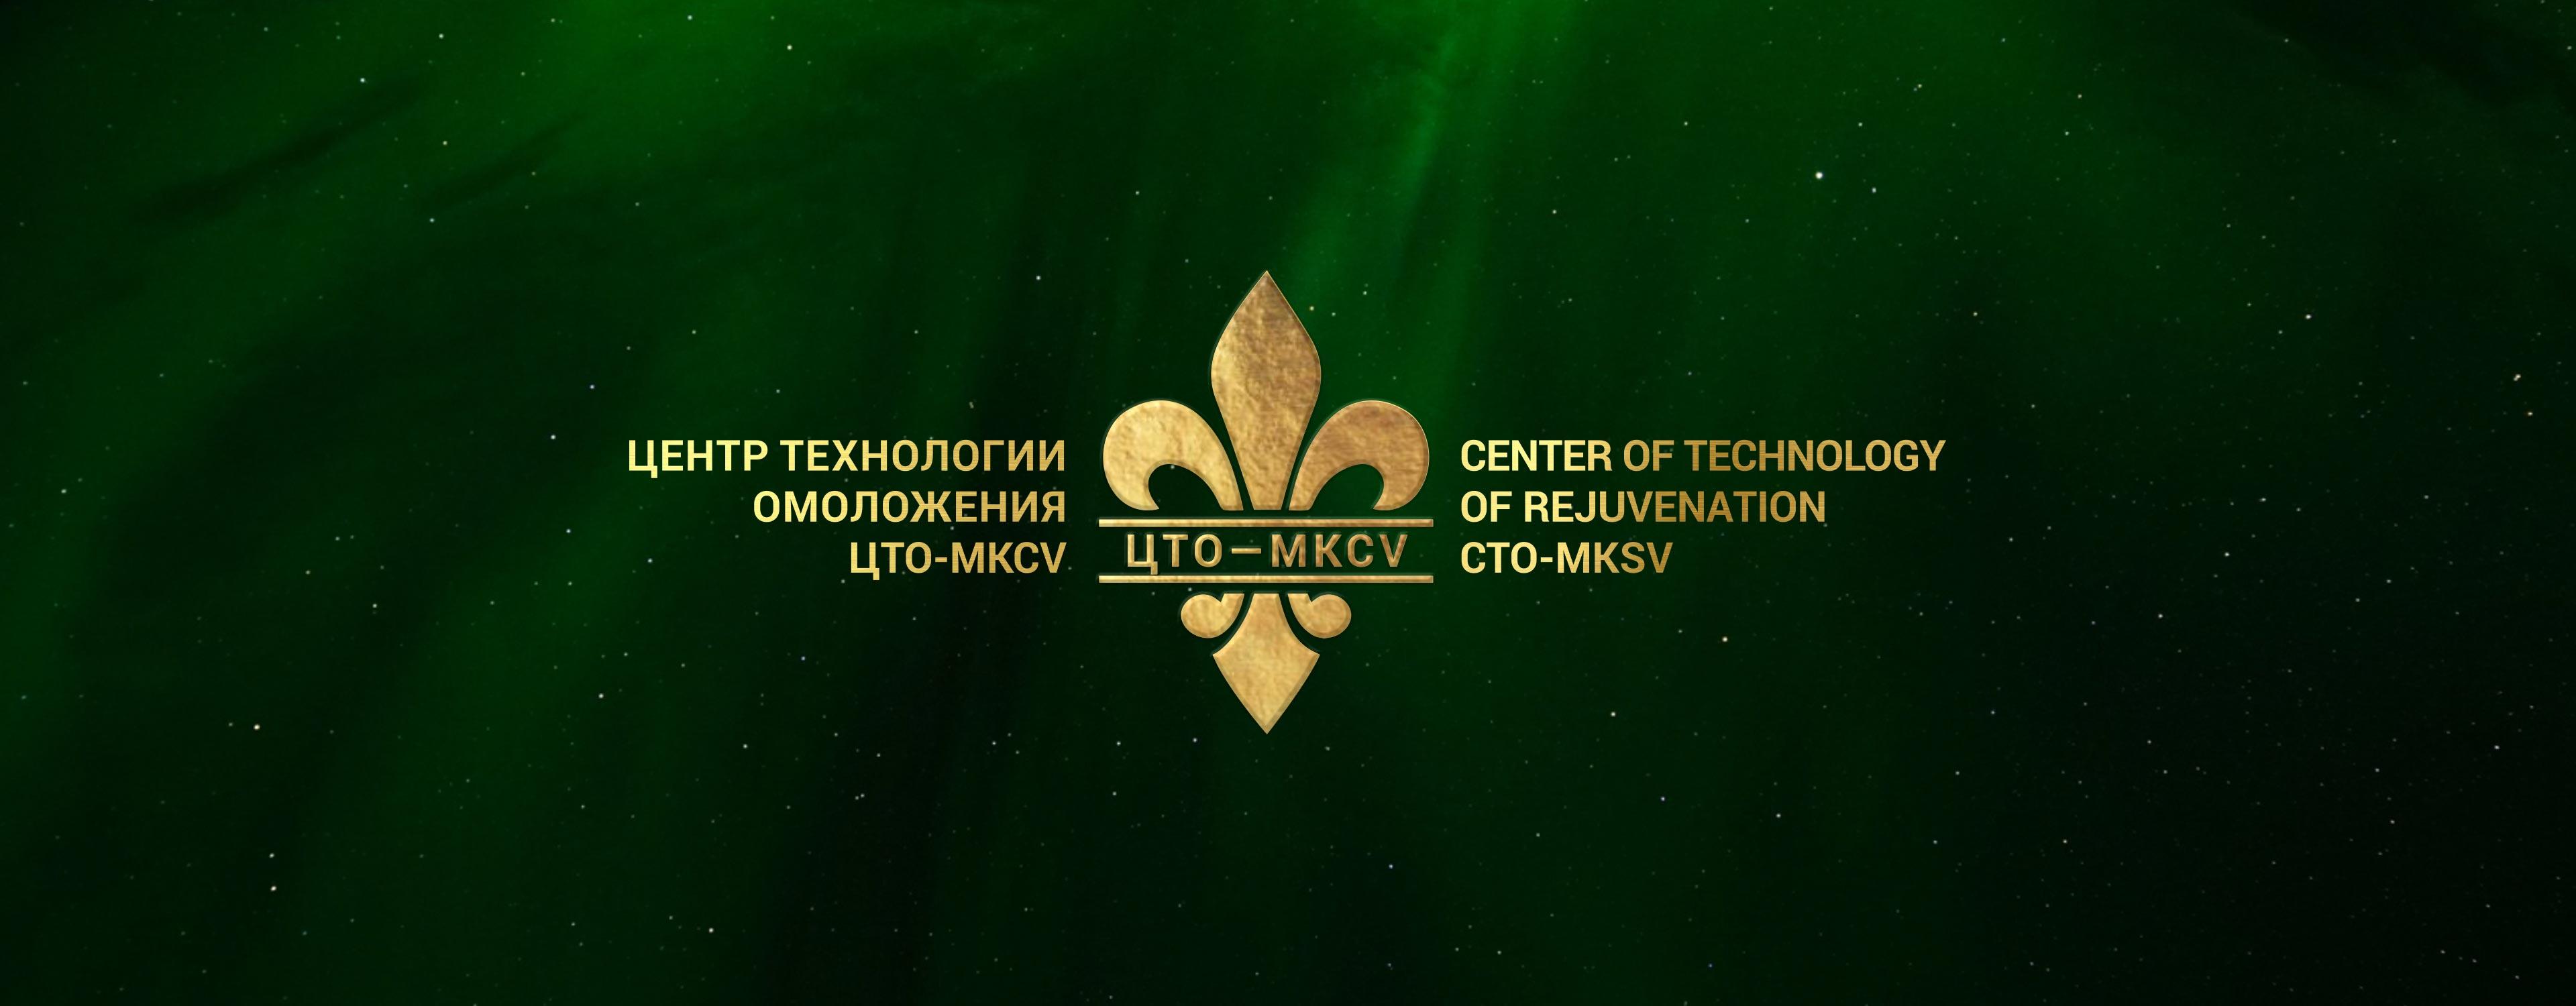 new-logo_mksv_3840x1500